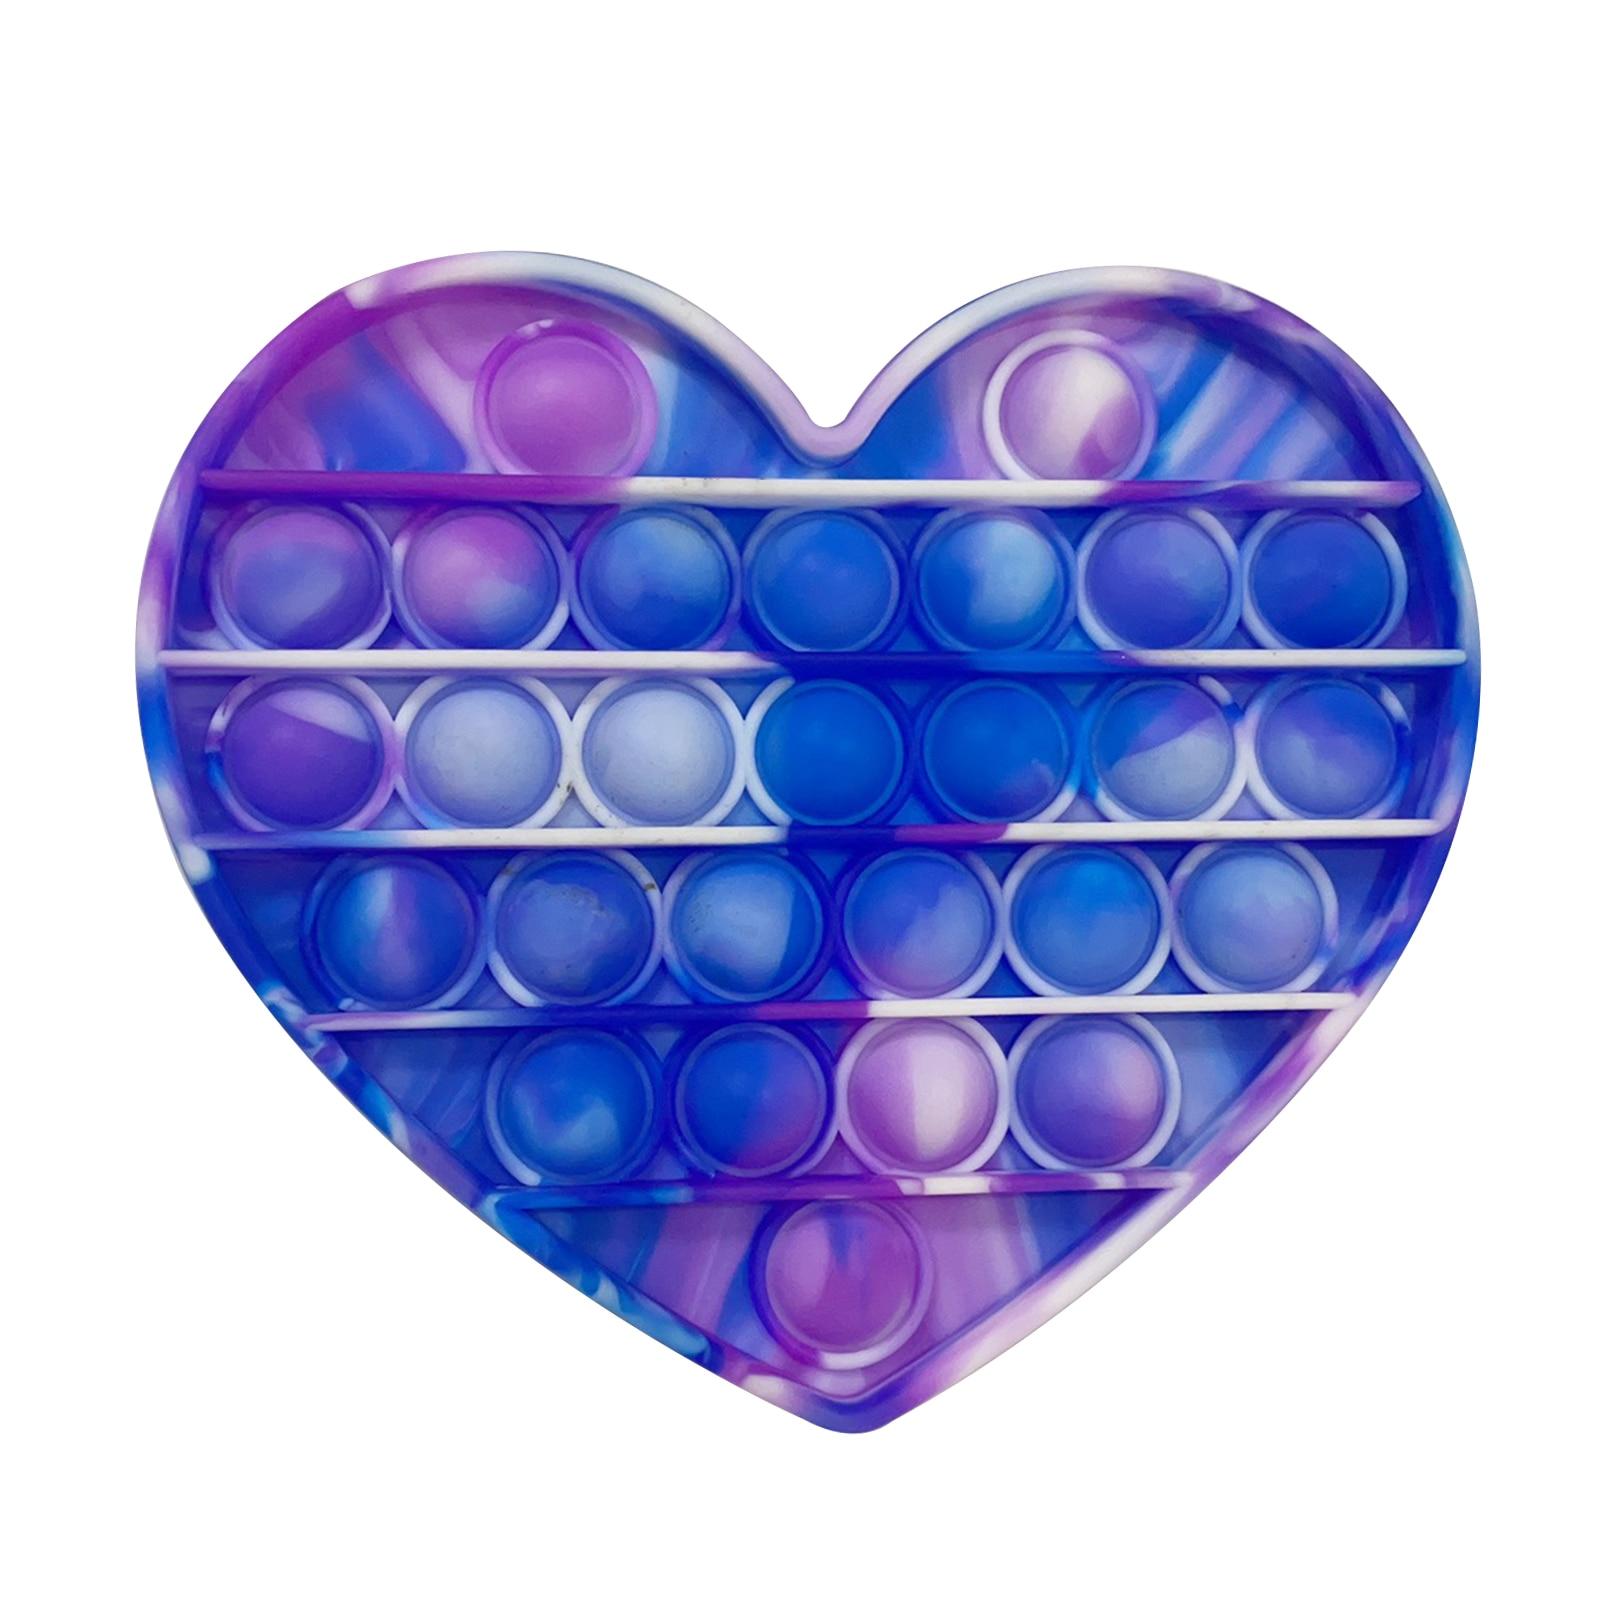 Toy Fidget-Toys Sensory-Toy Autism Needs-Stress Push Bubble Popit Special Simple Dimple img5